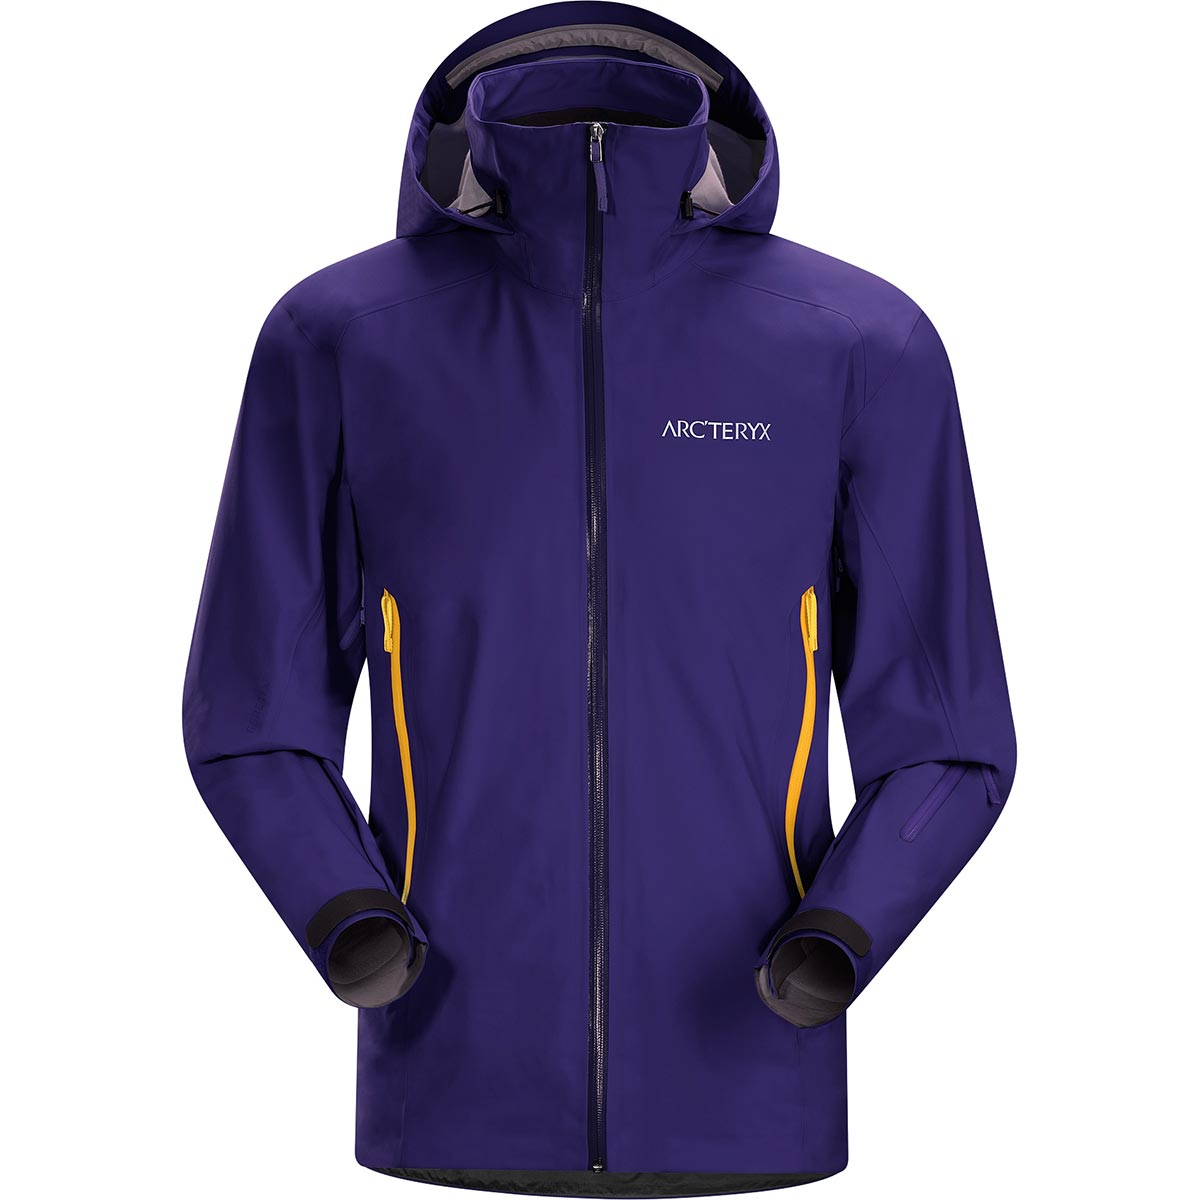 Arc Teryx Stingray Jacket Men S Discontinued Colors